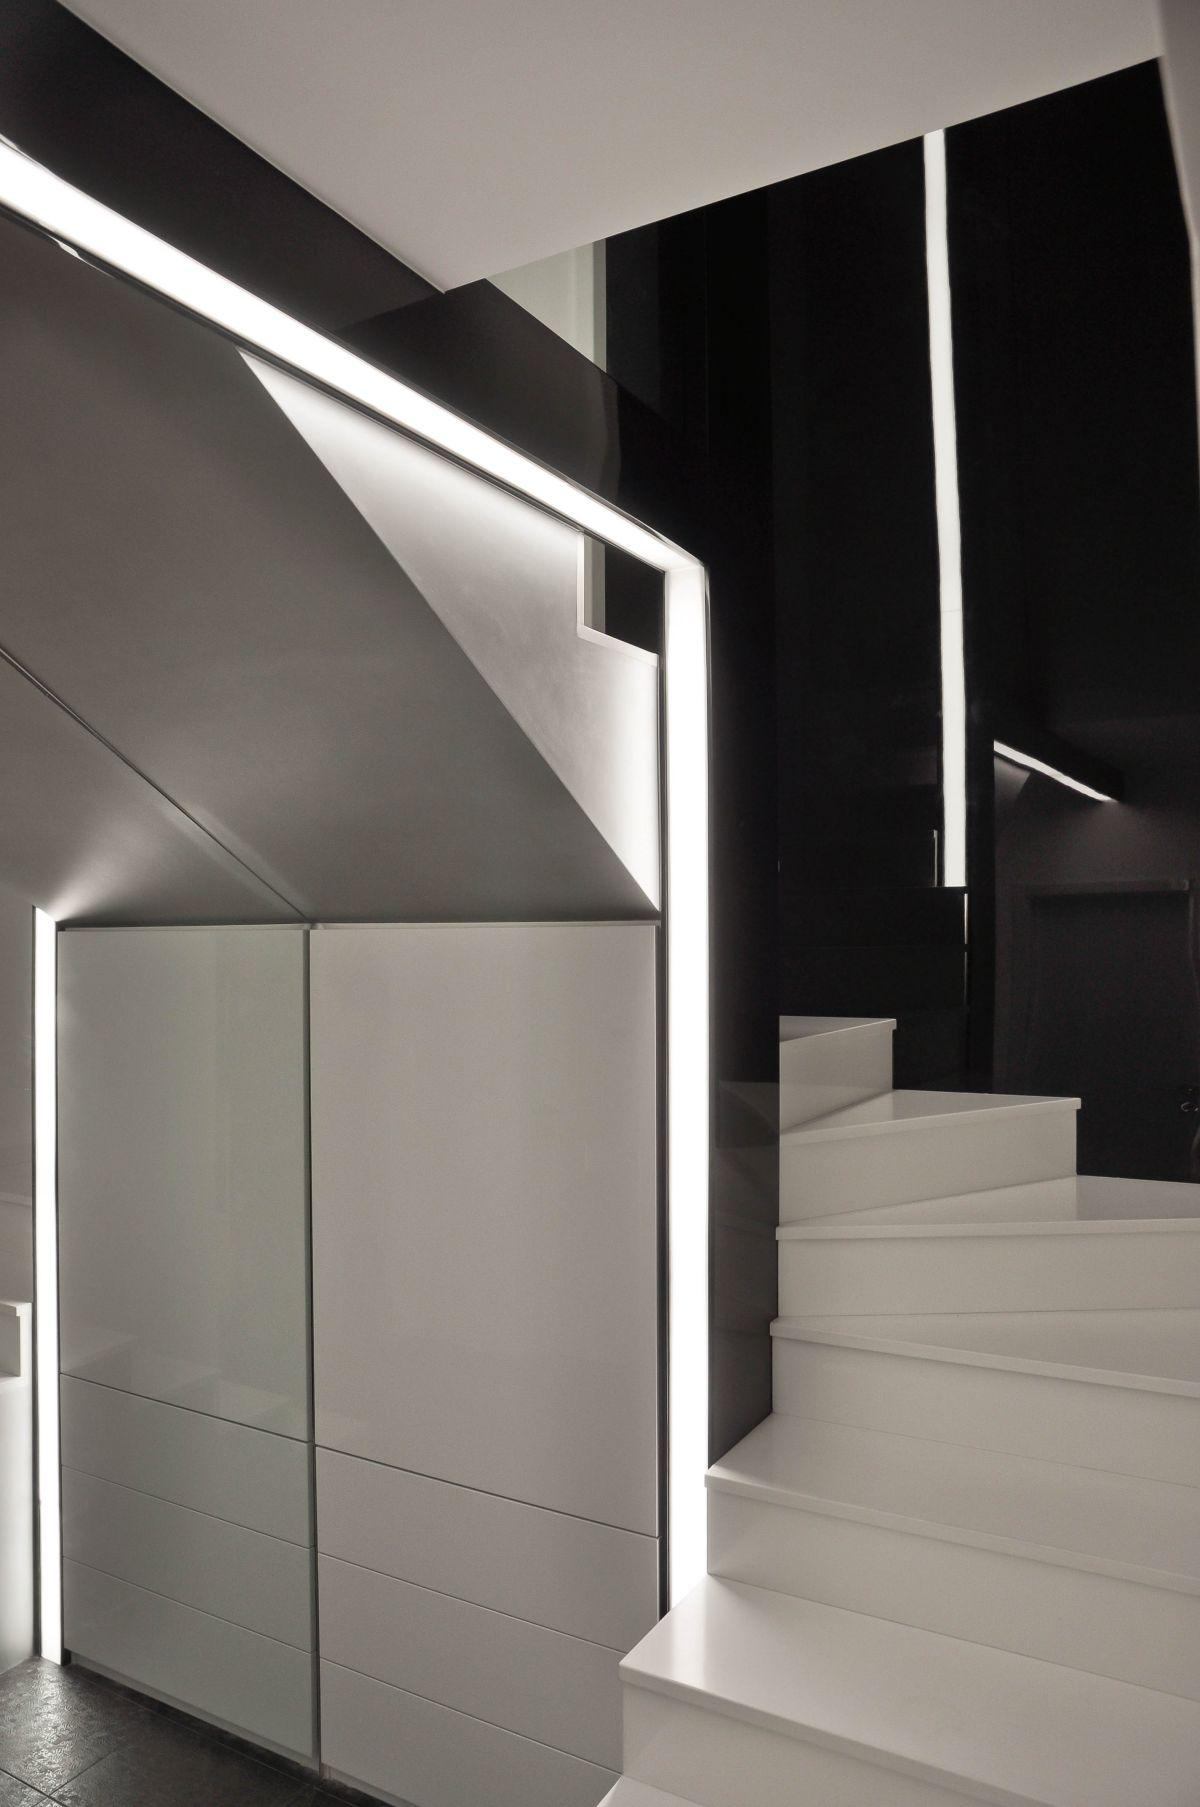 Staircase, Apartment Interior by Jovo Bozhinovski